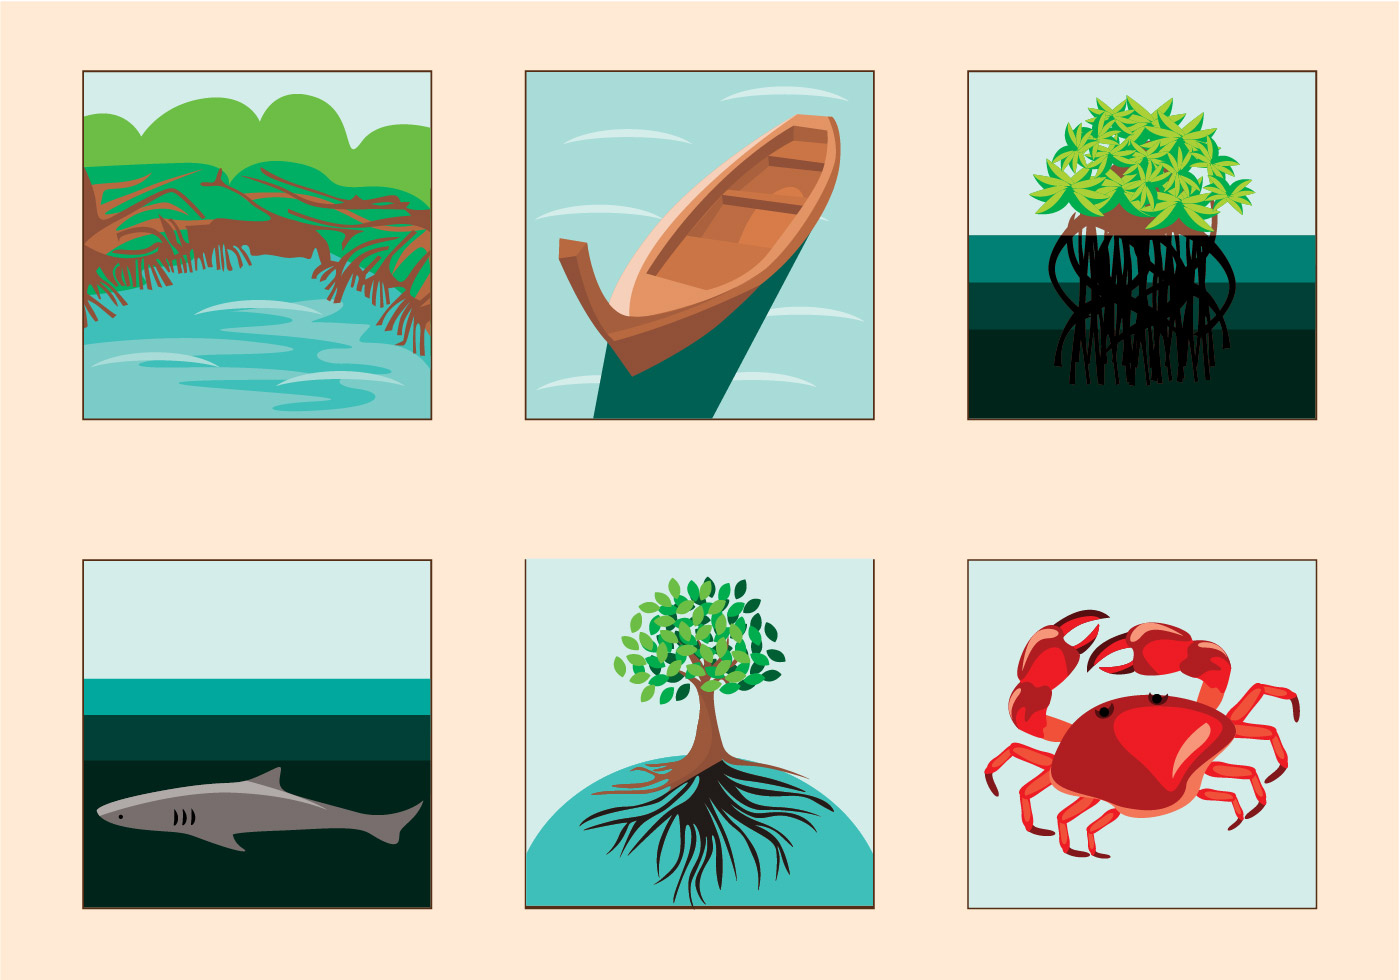 Free Mangrove Illustration.